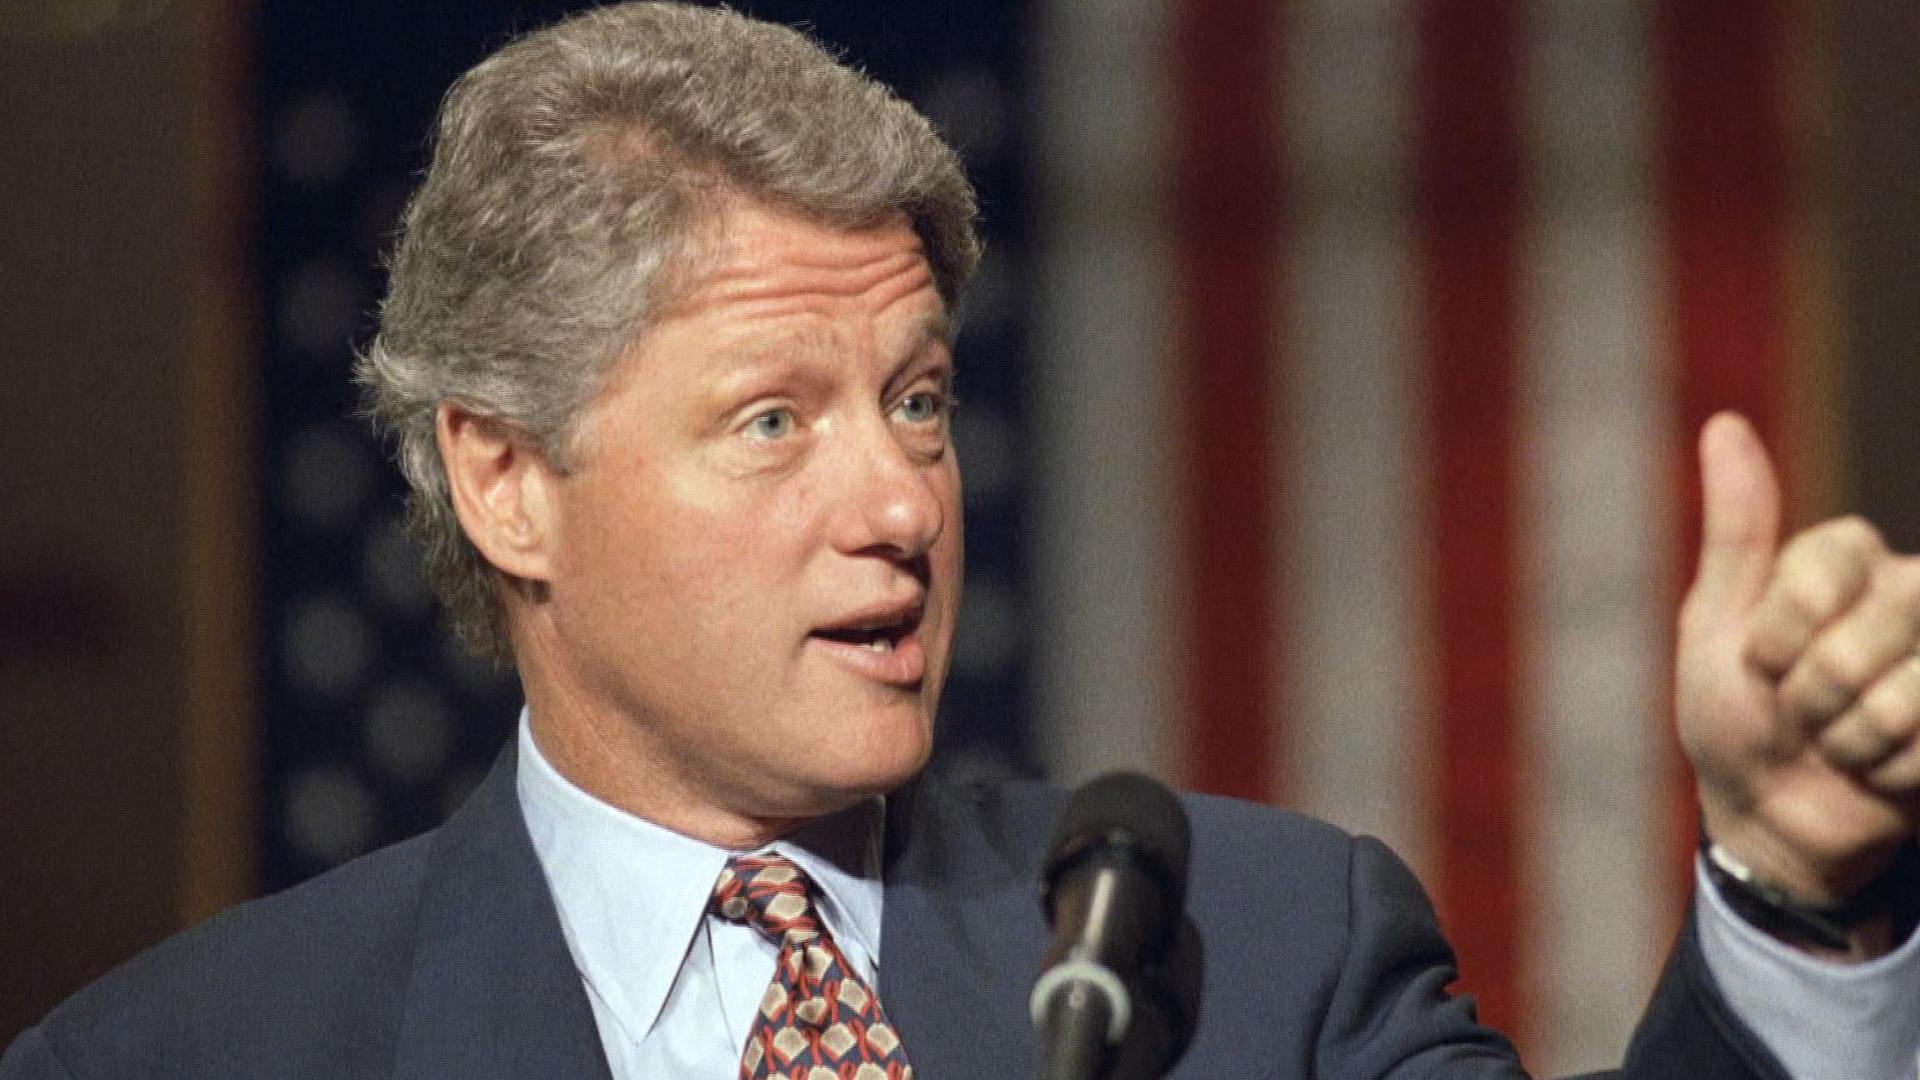 Diving into the Clinton document dump